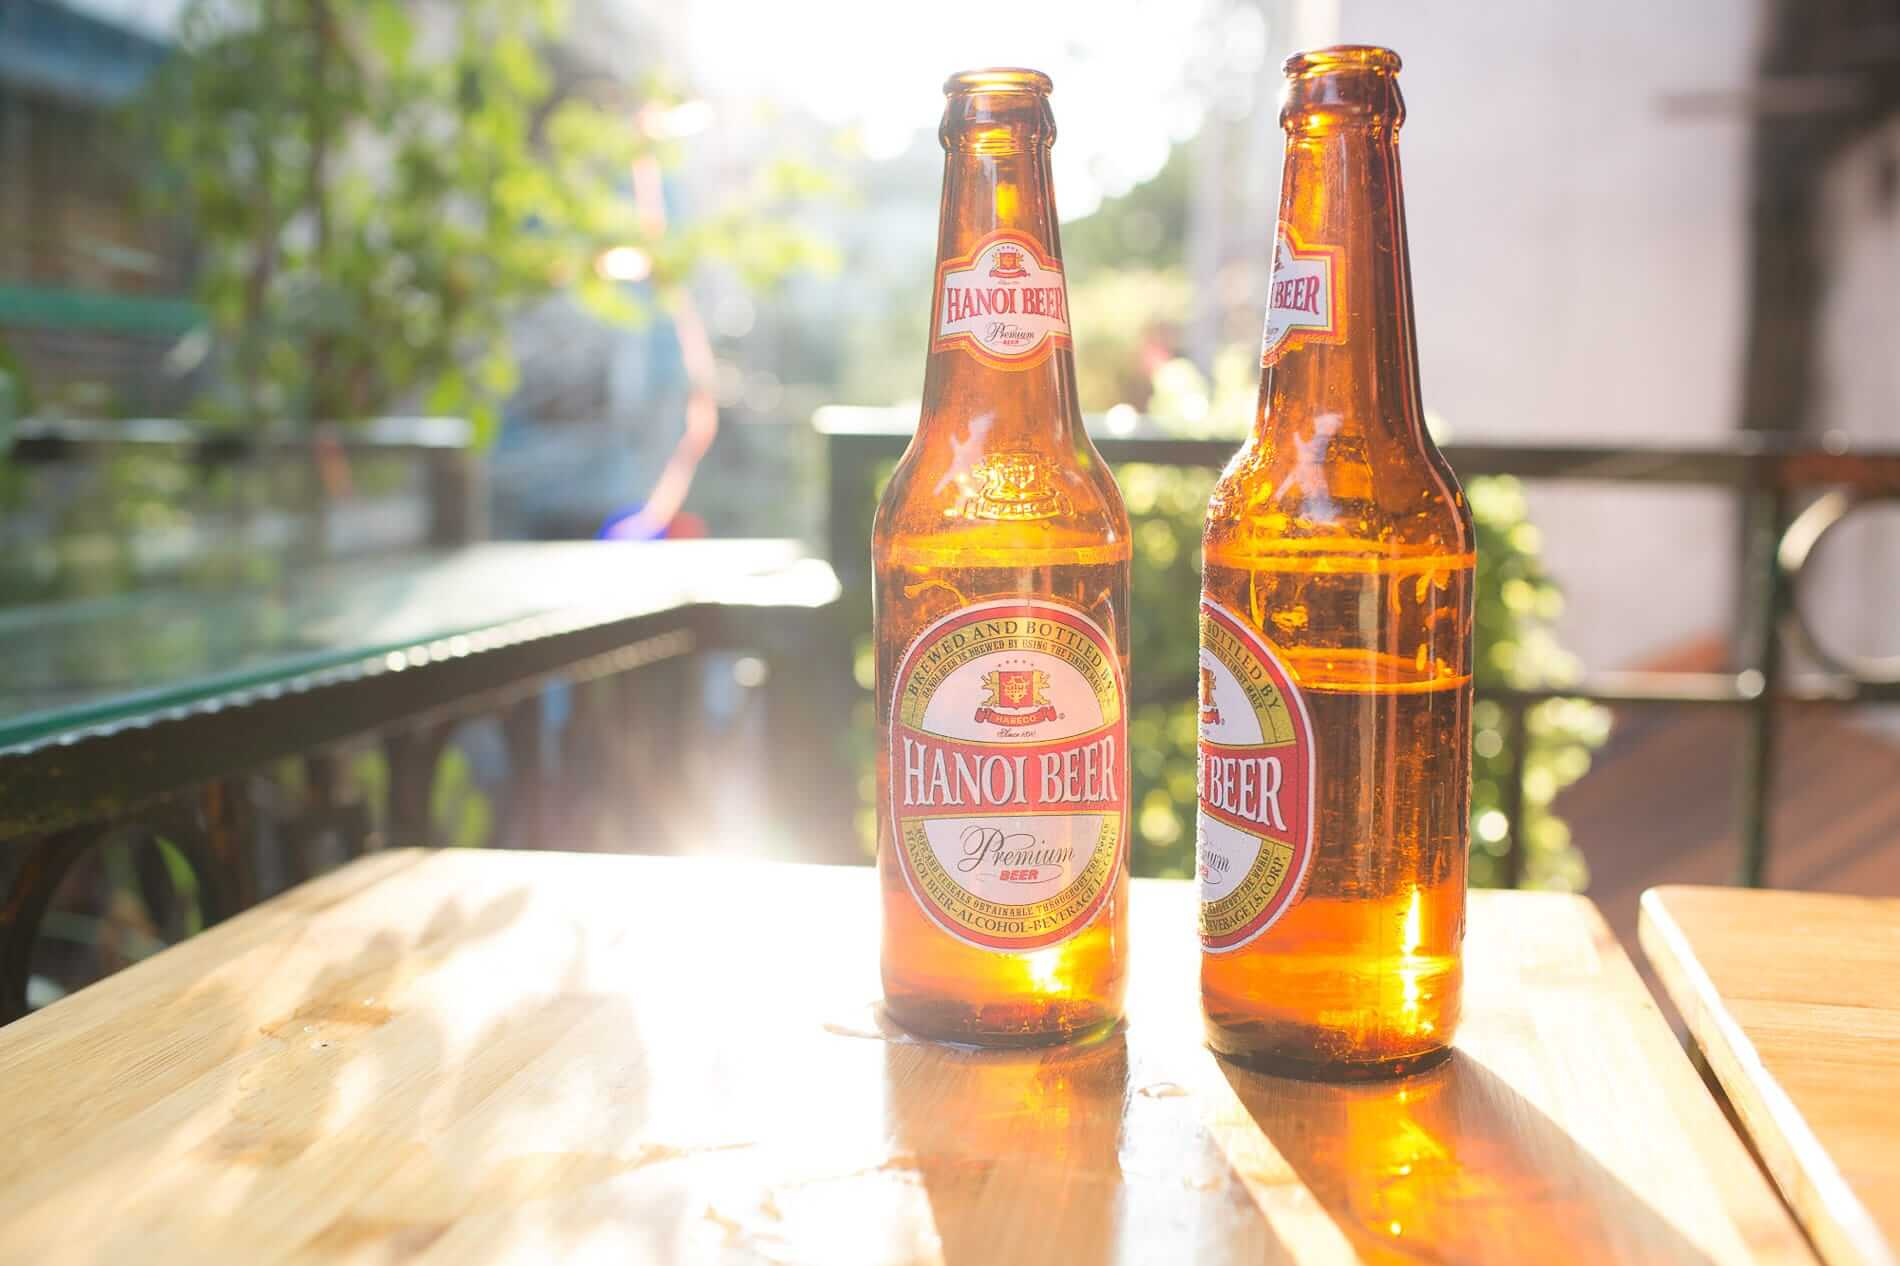 Hanoi Beer on display